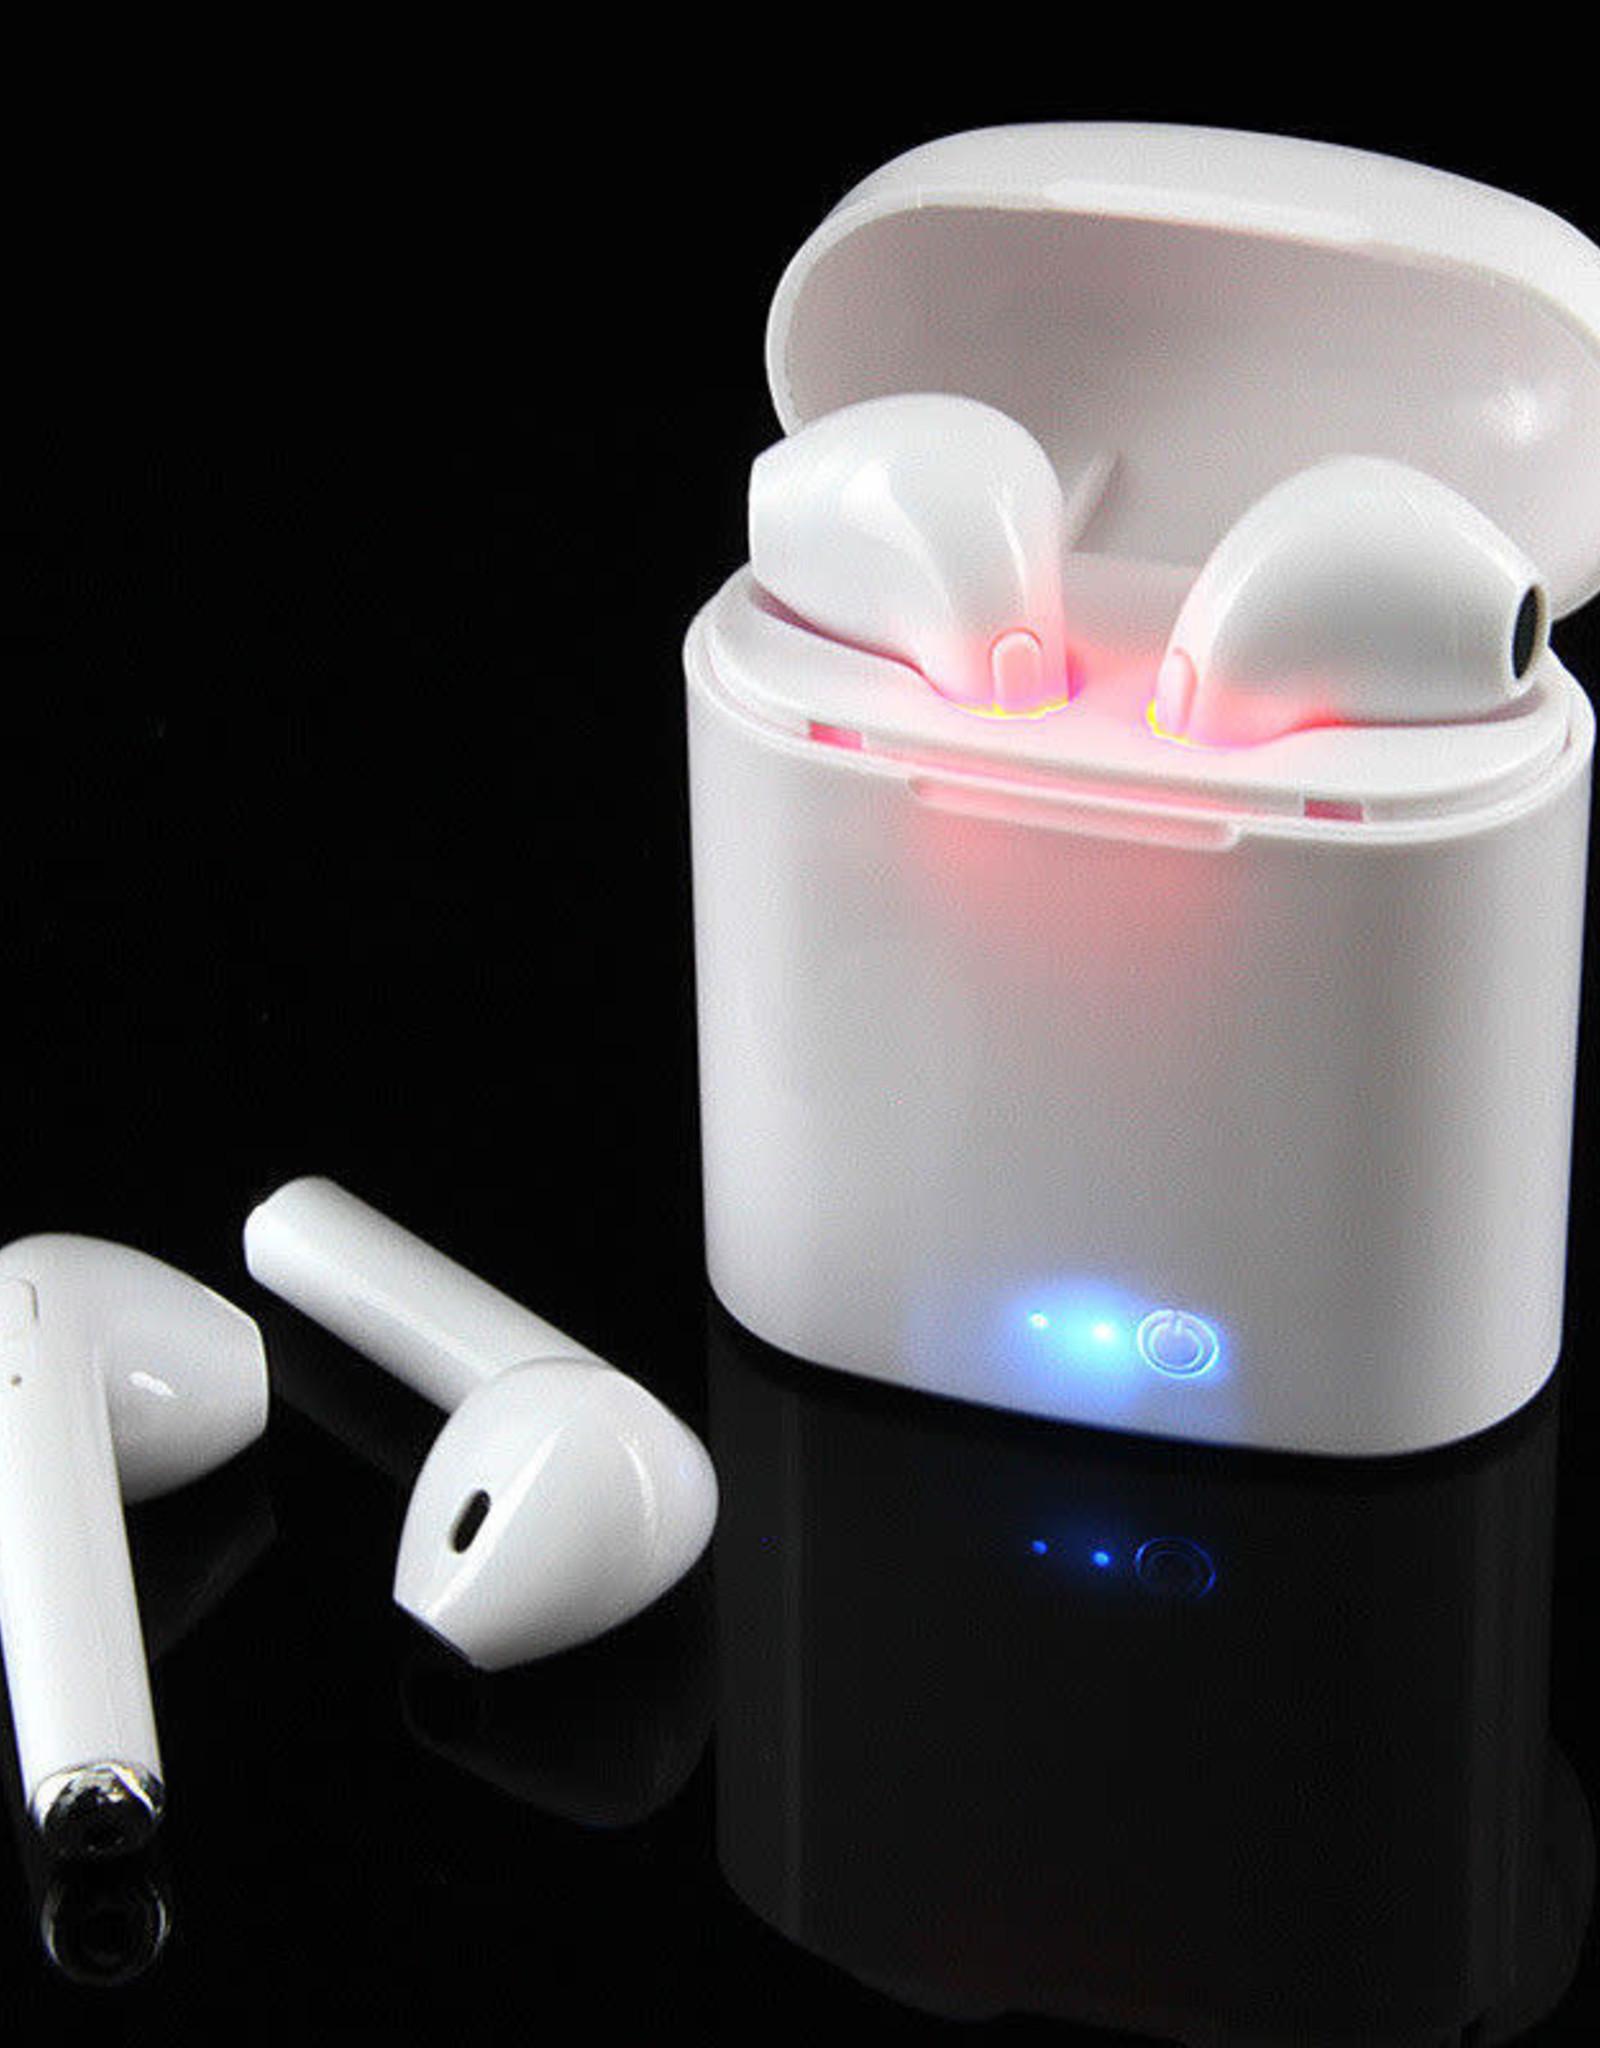 Bluetooth Wireless Earphones w/ Charging Case